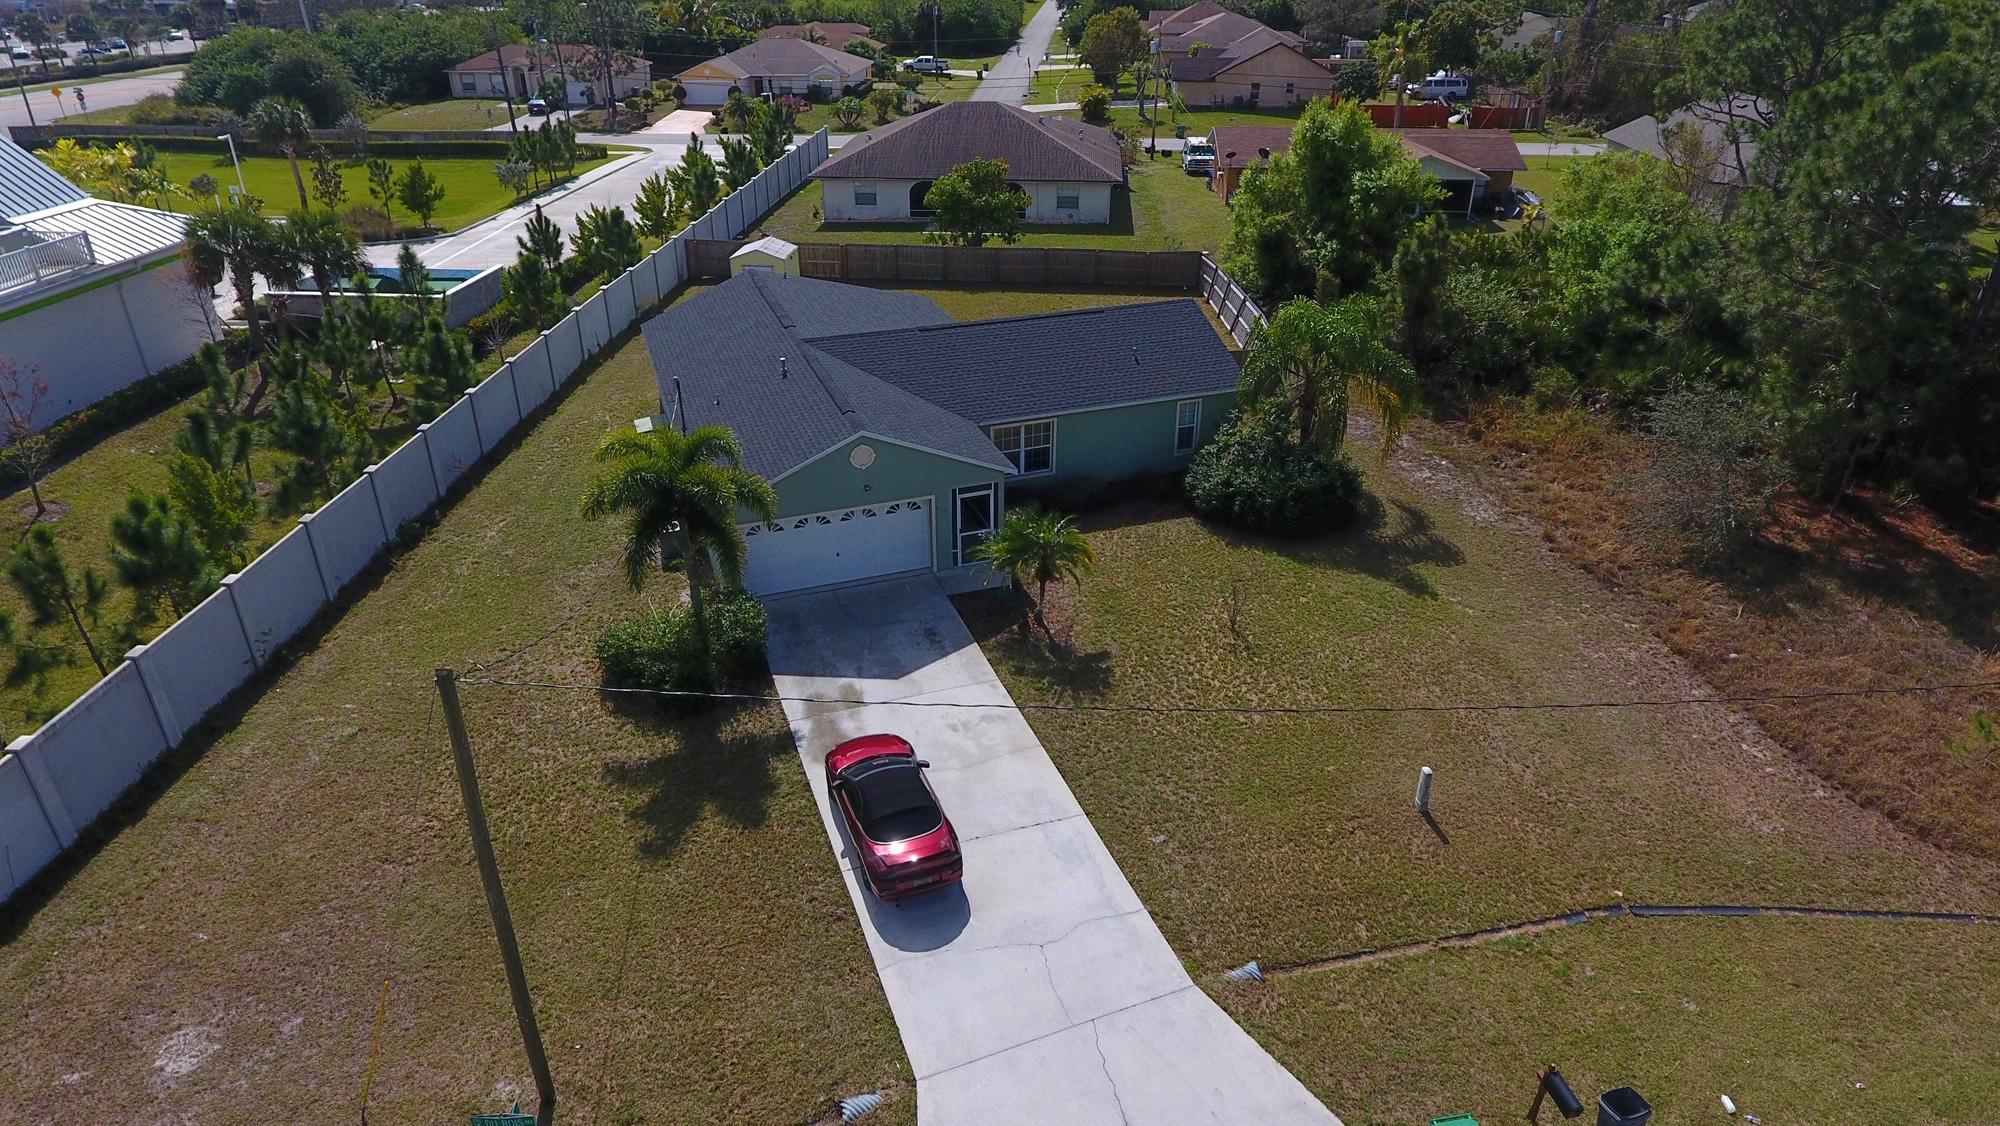 900 SW Dubois Avenue - Port St Lucie, Florida